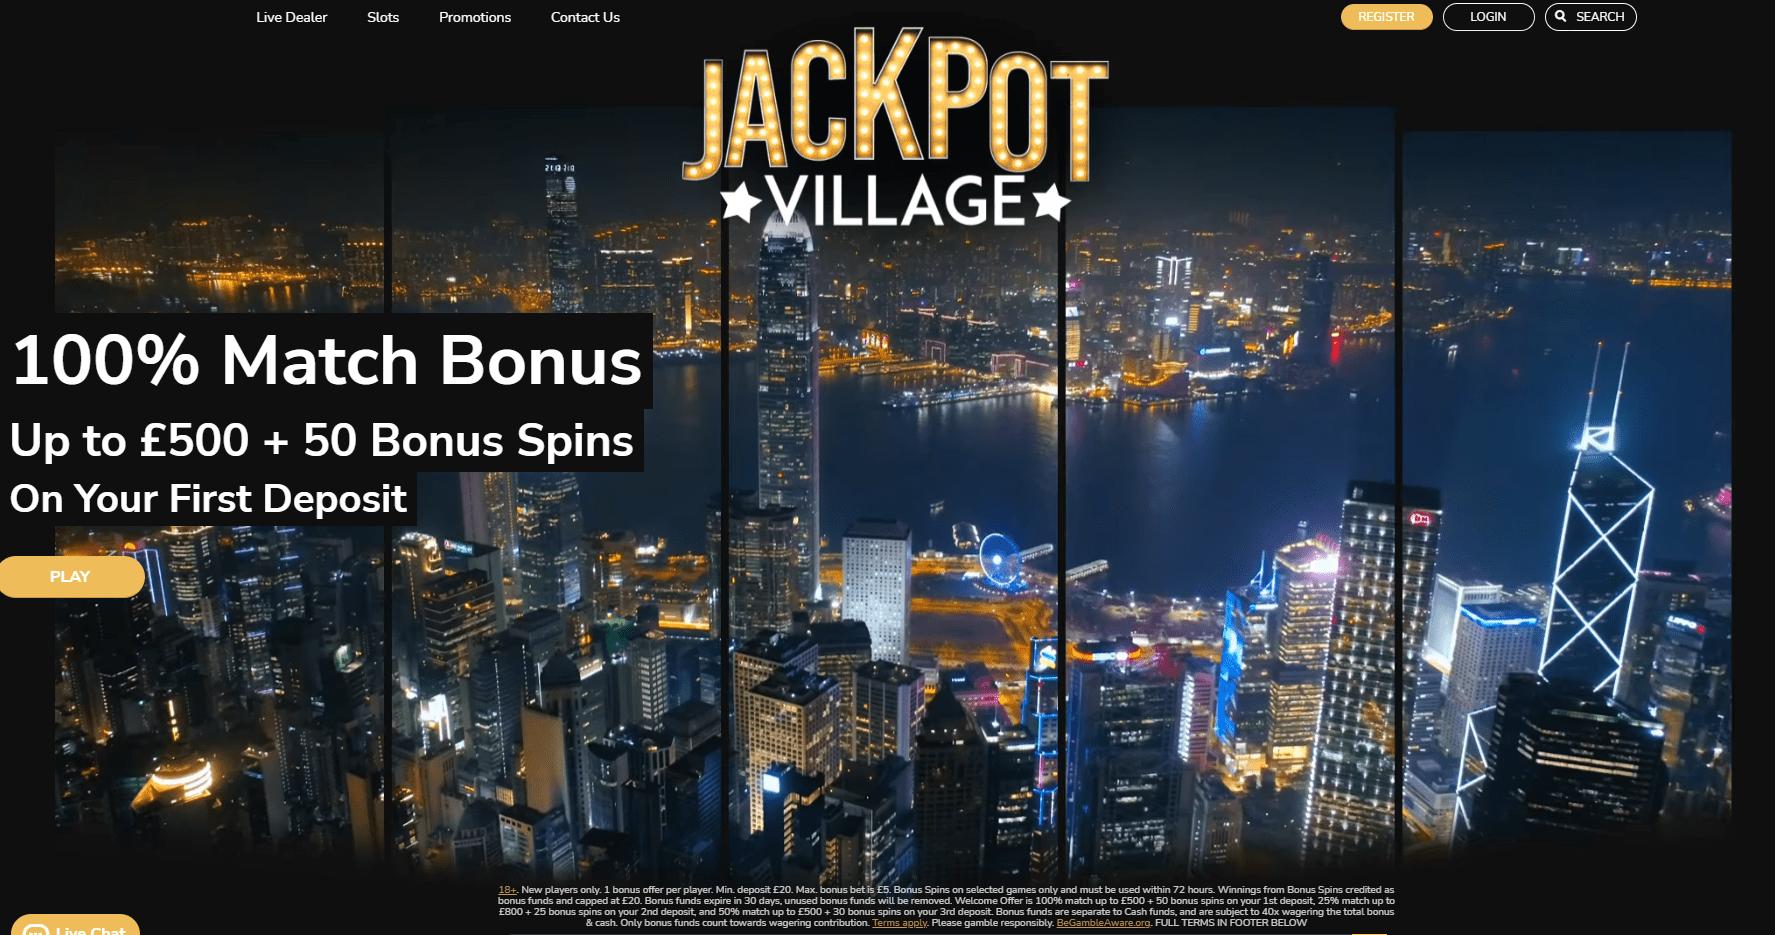 jackpot village landing page